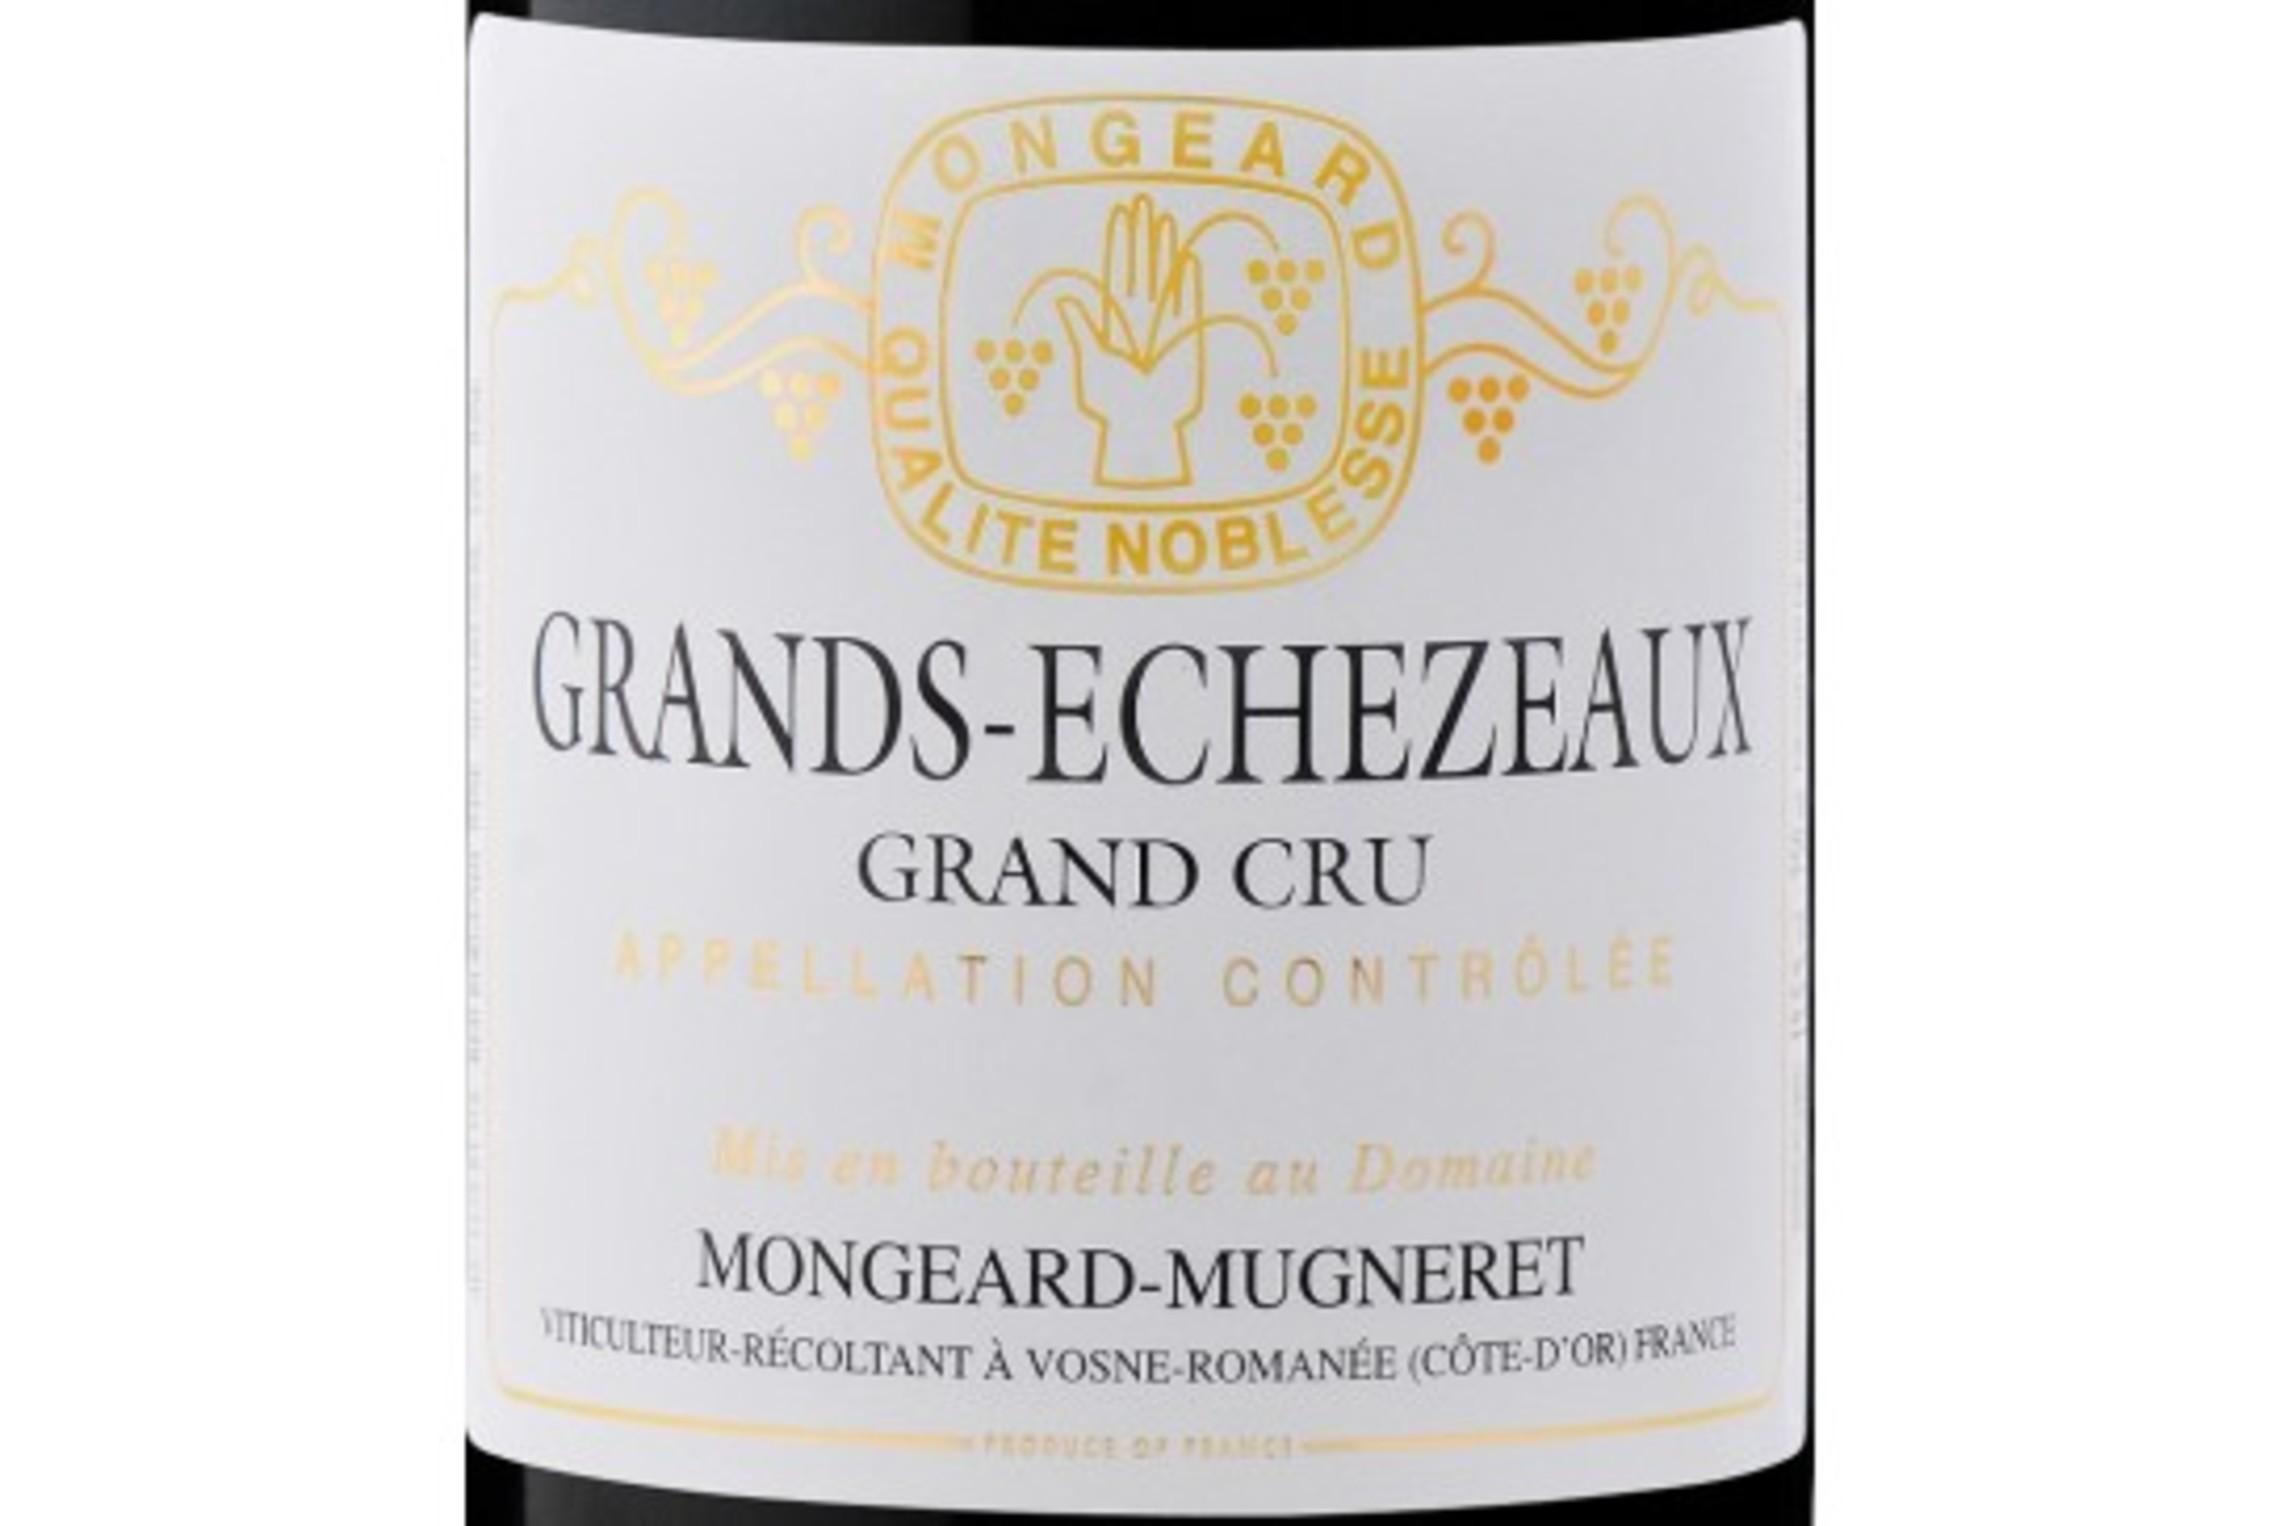 2012 Mongeard-Mugneret Grands-Echezeaux